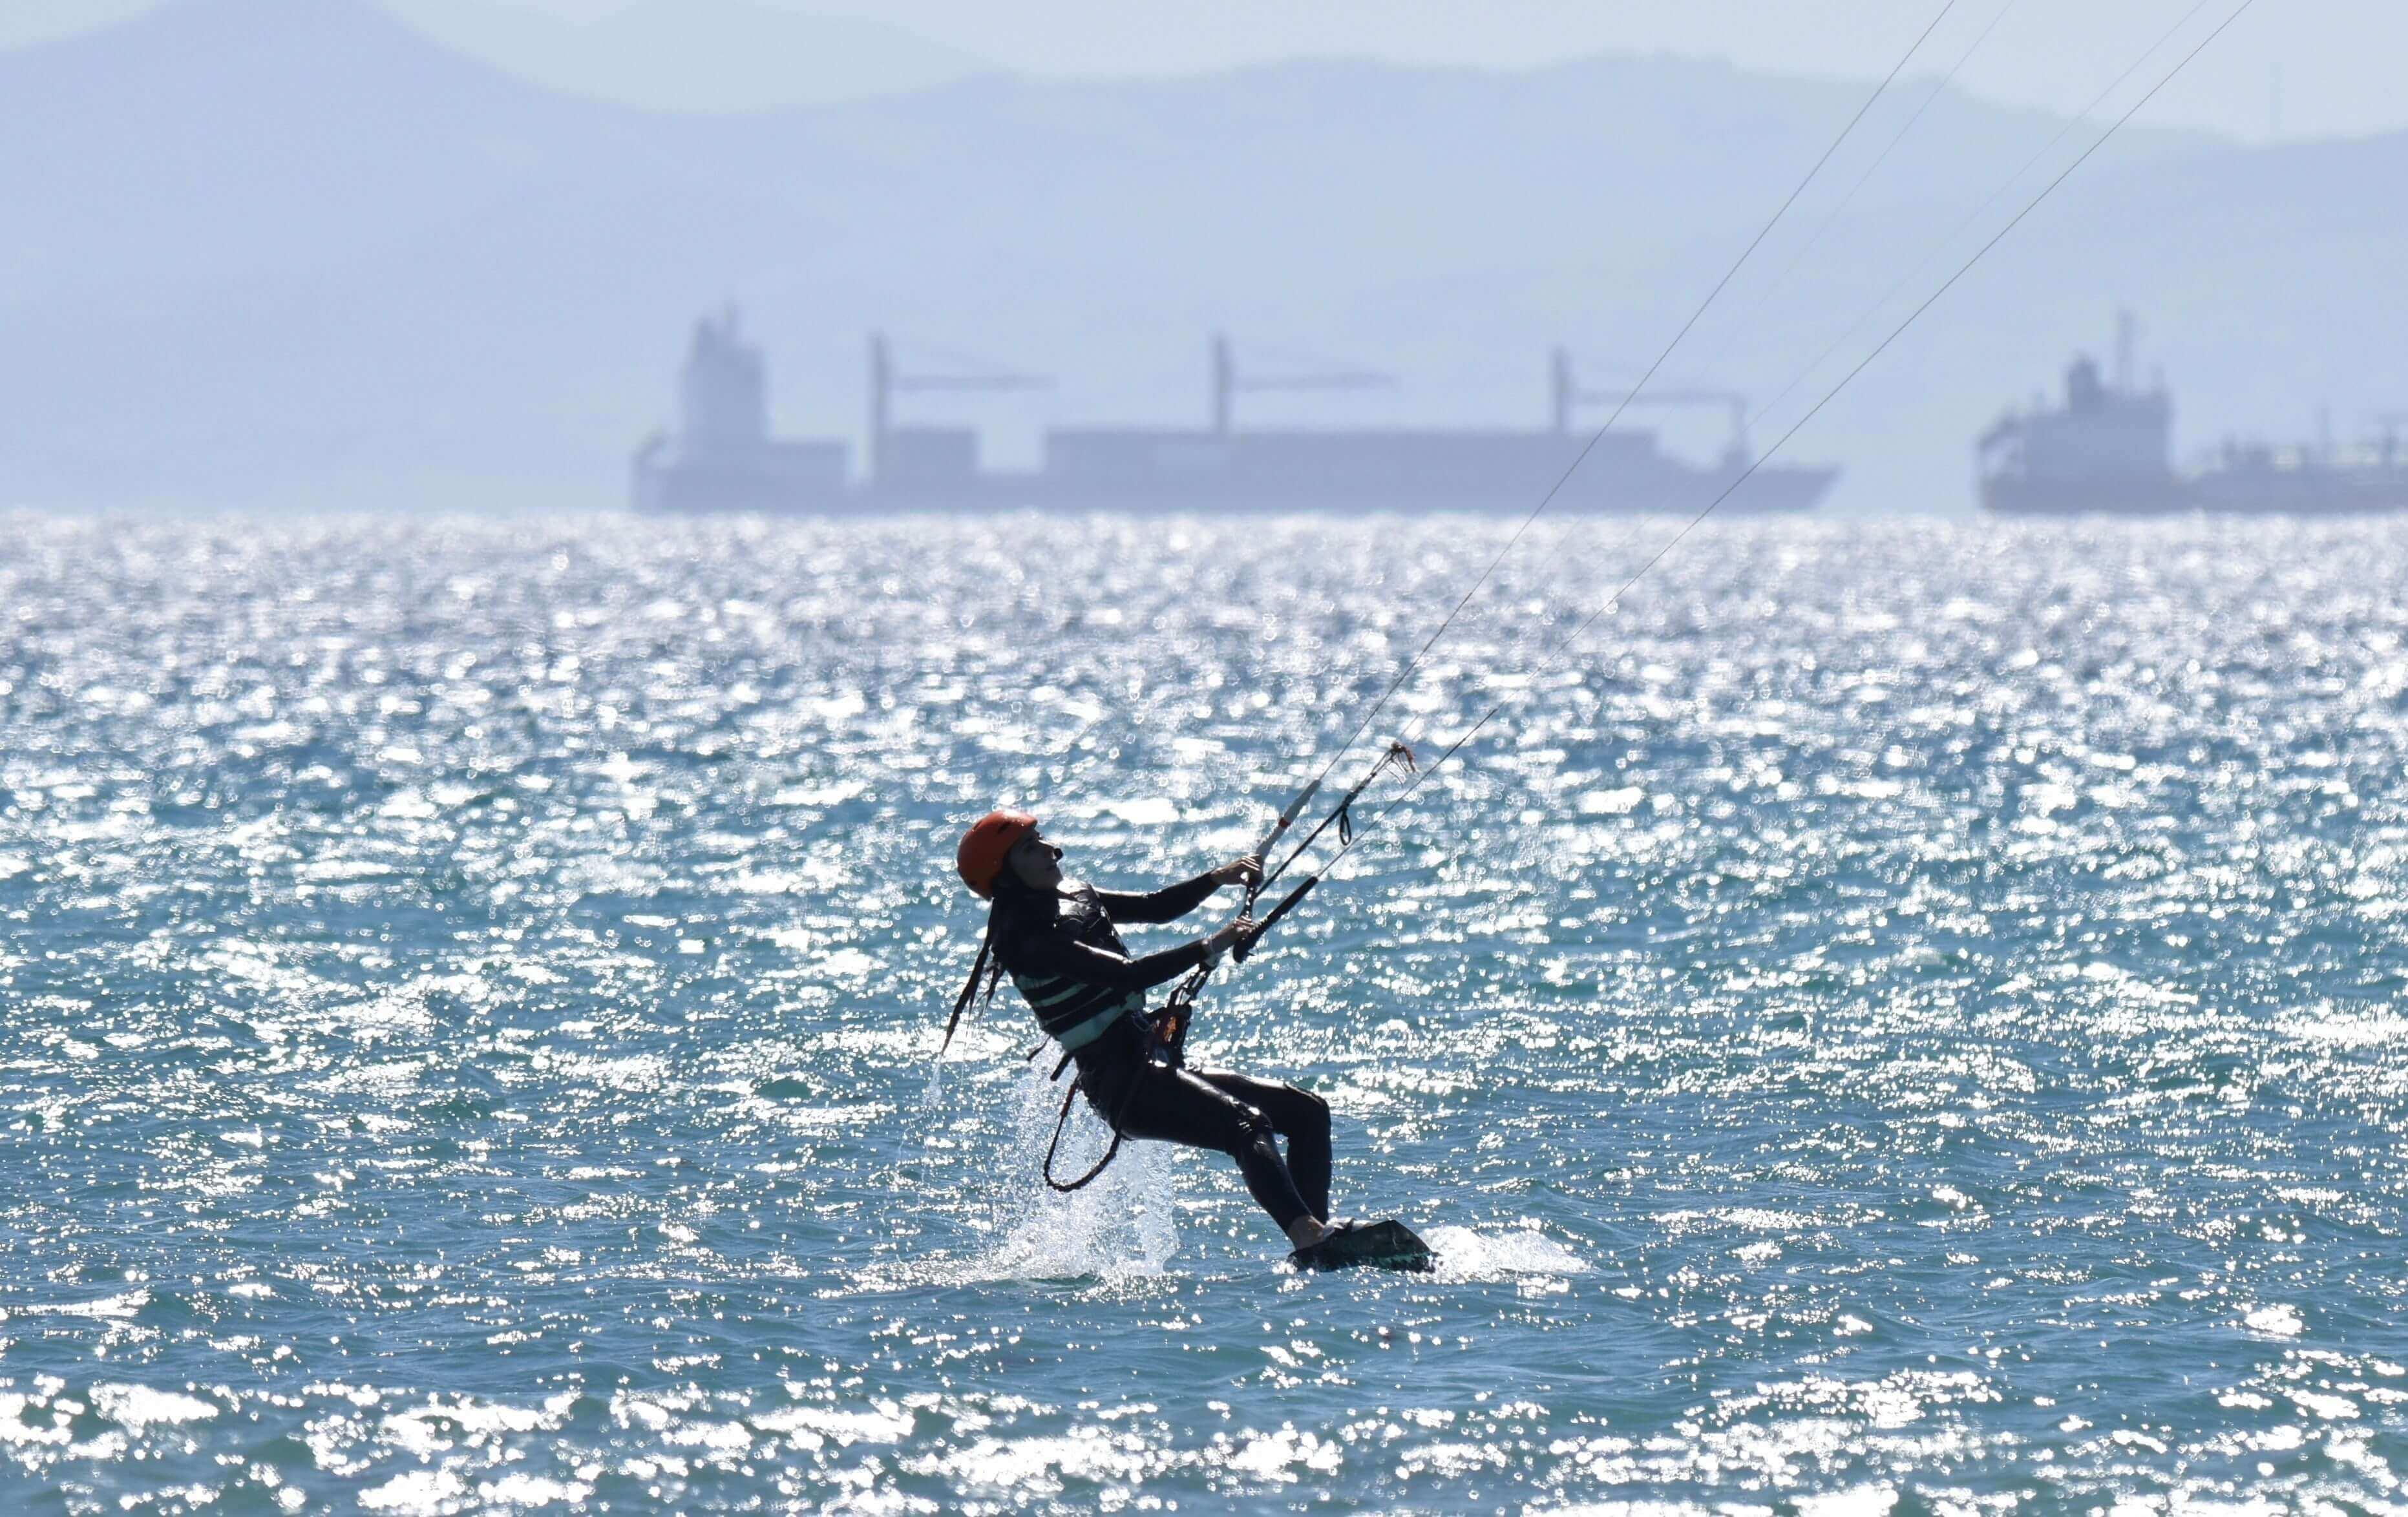 Curso de kitesurf en tarifa intensivo